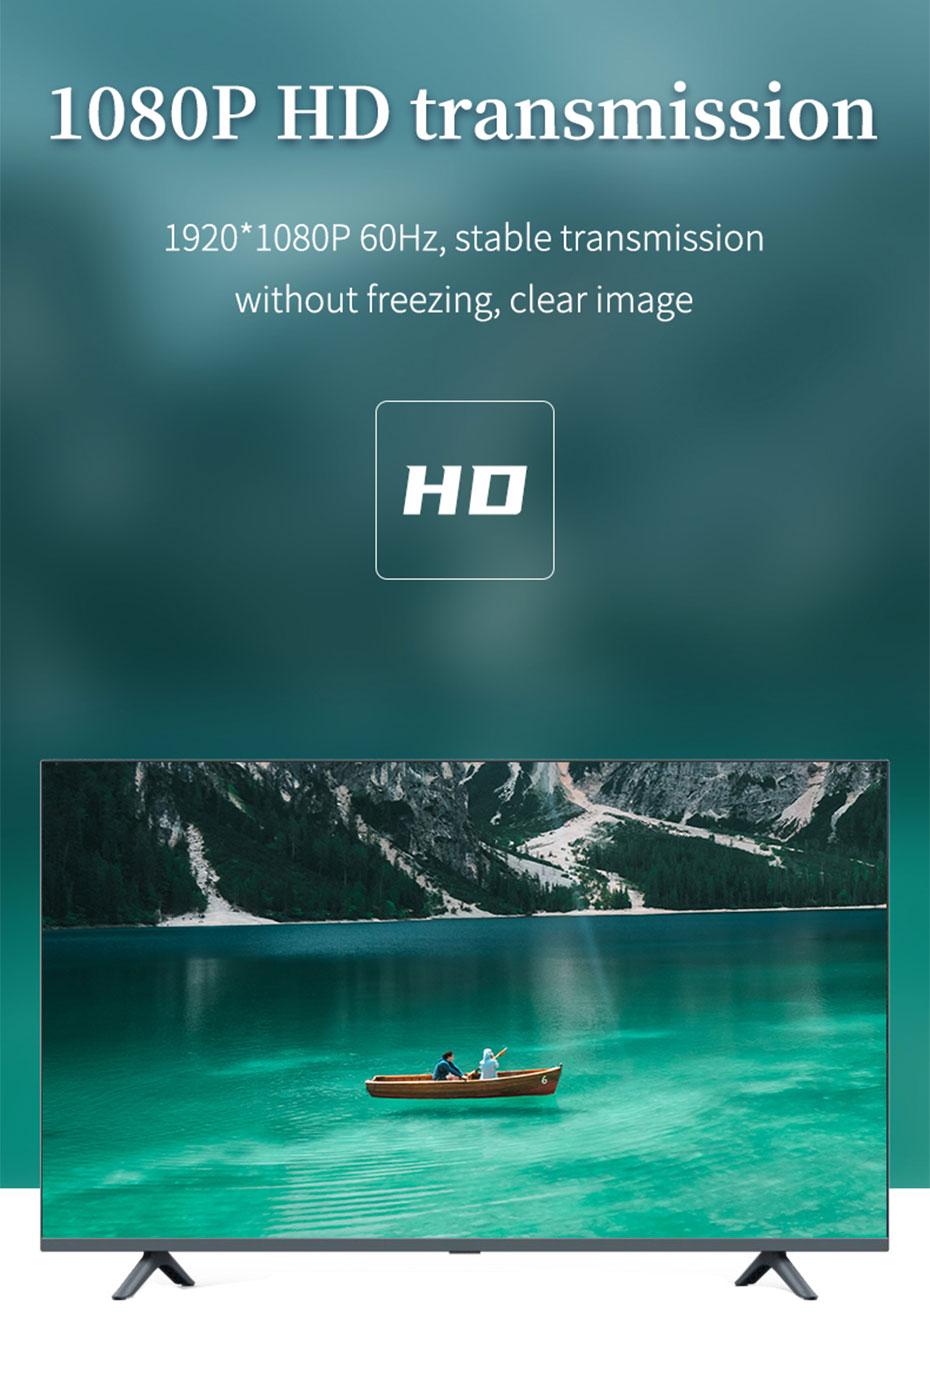 HDMI KVM fiber optic extender HE001 supports 1920*1080p@60Hz HD resolution